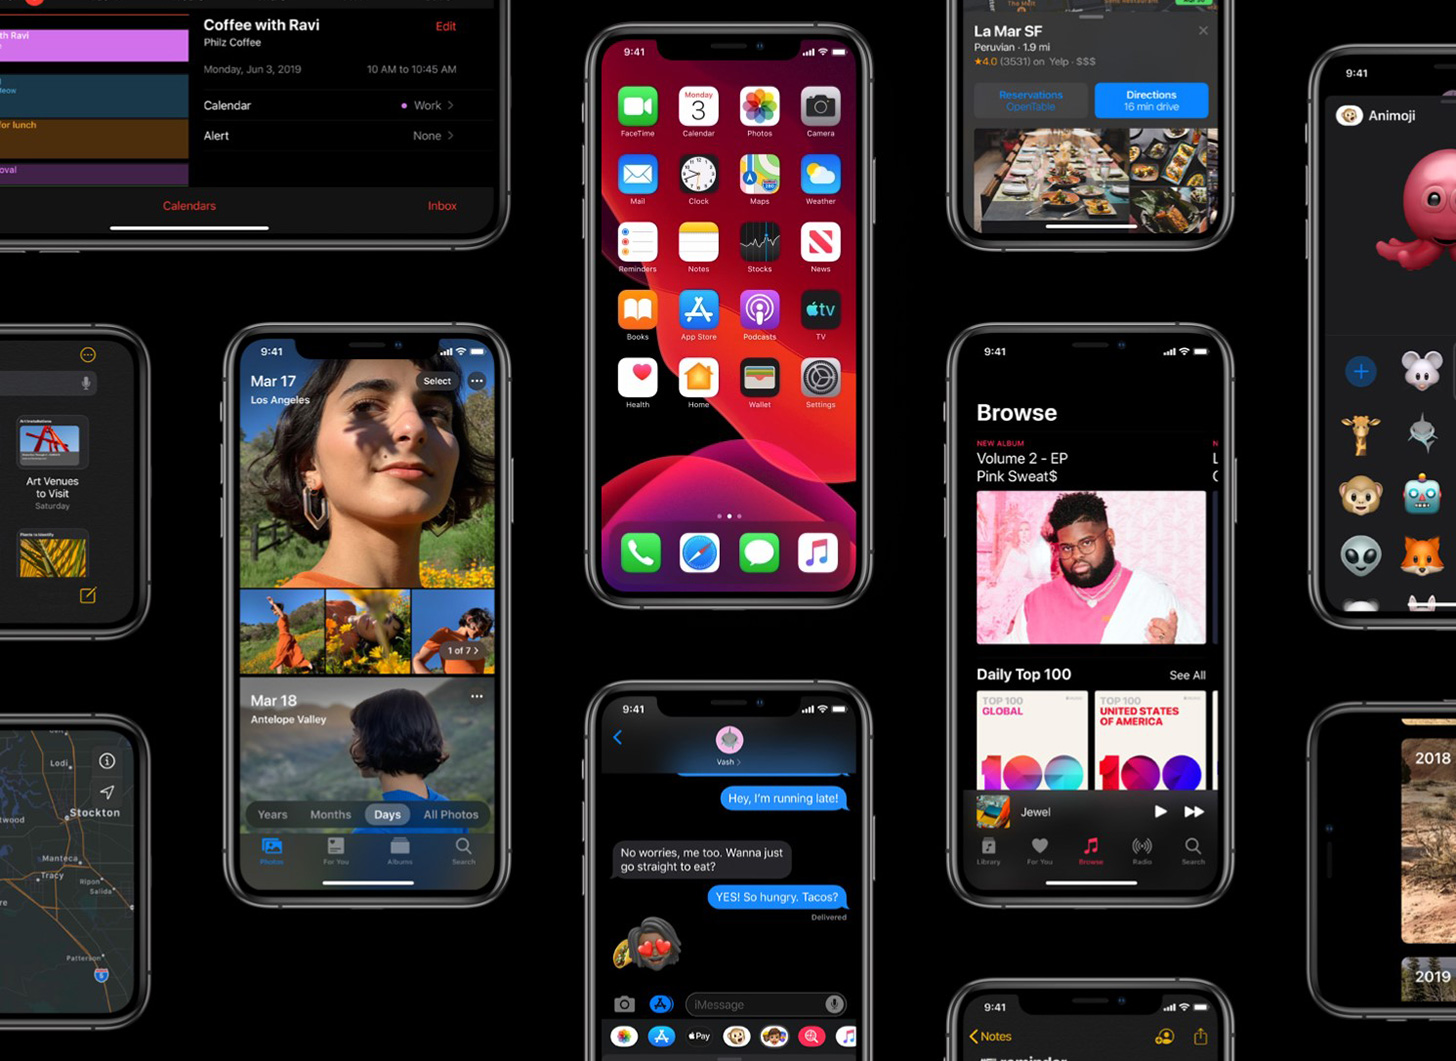 iOS 13 beta 3, watchOS 6 beta 3 updates released by Apple